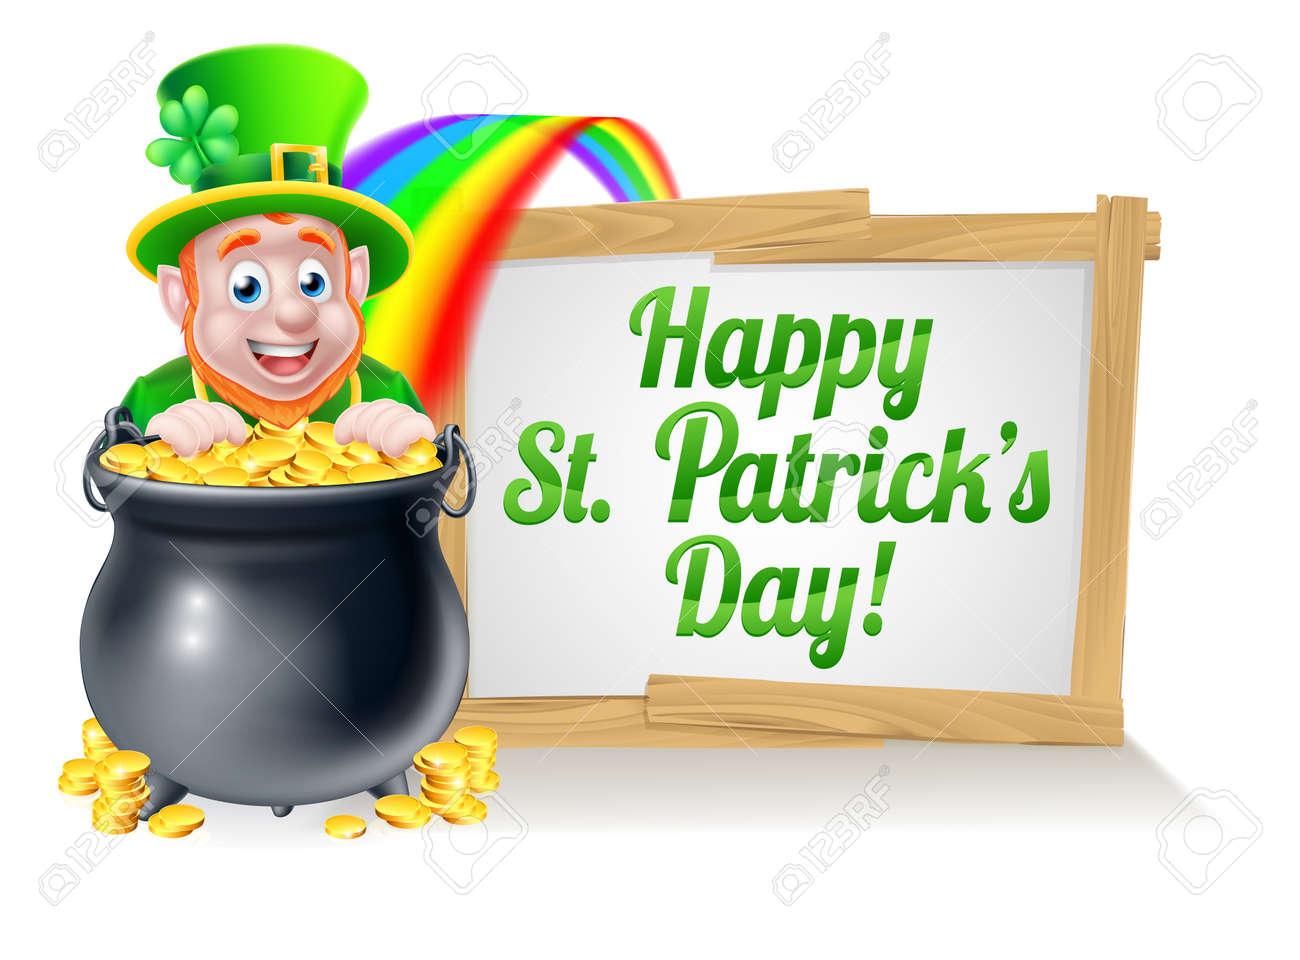 leprechaun cartoon st patricks day character peeking over a pot